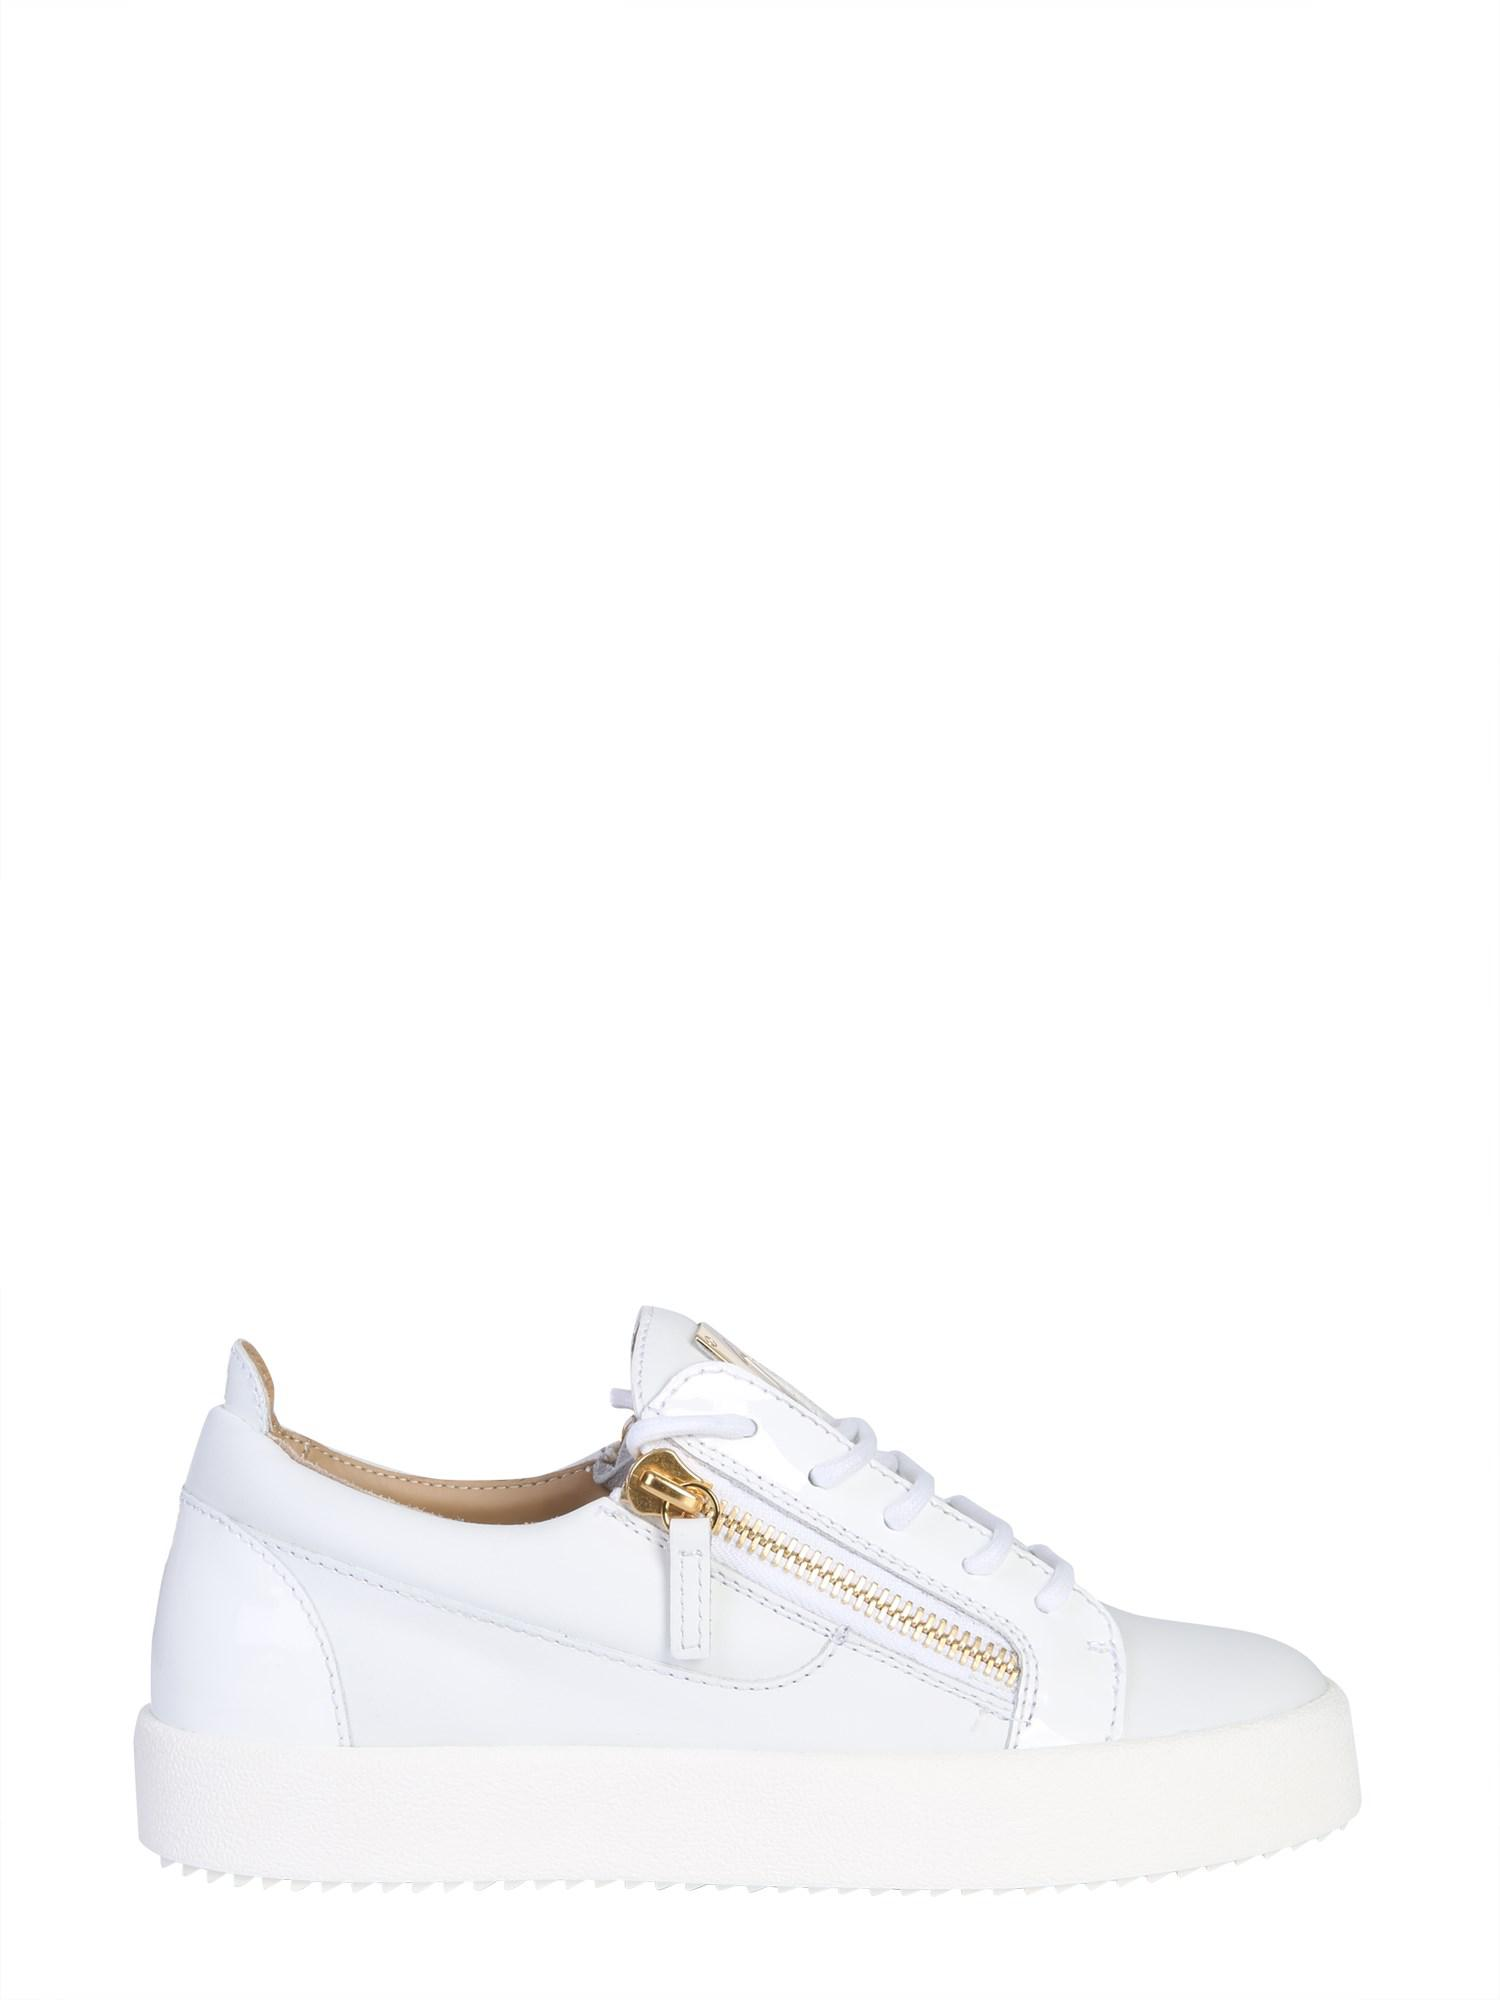 2869fbc44ac74 Lyst - Giuseppe Zanotti Nicki Low-top Nappa Sneakers With Zip in White